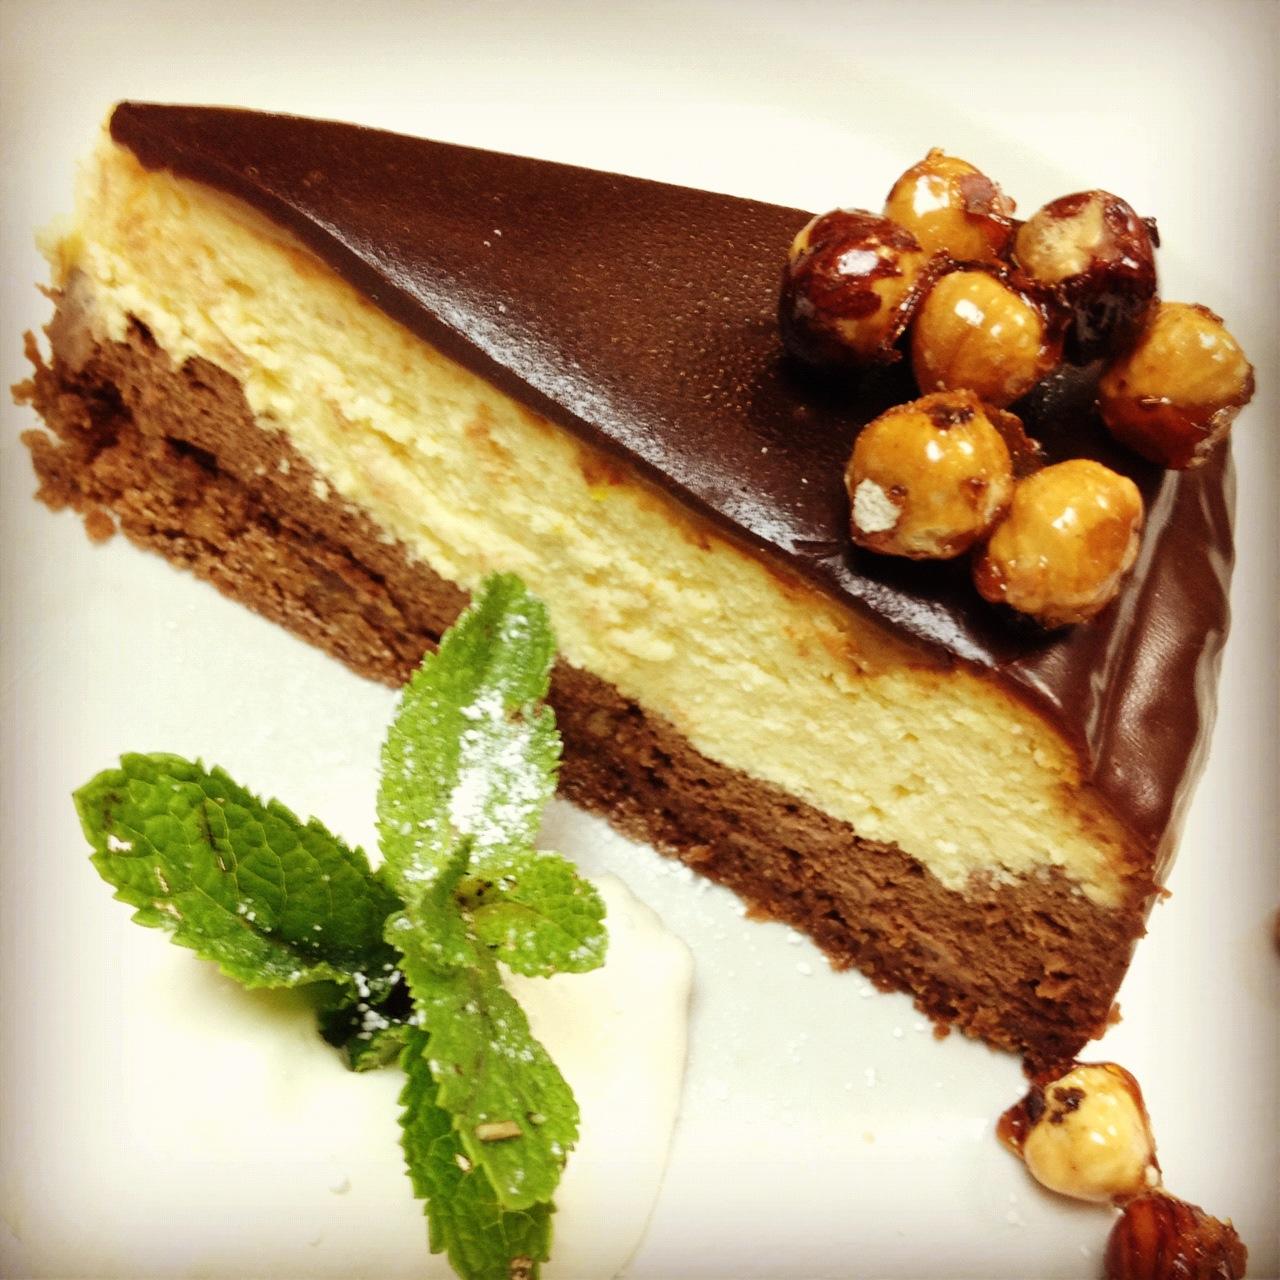 Mildred's Vegetarian Recipes: New Dessert Menu